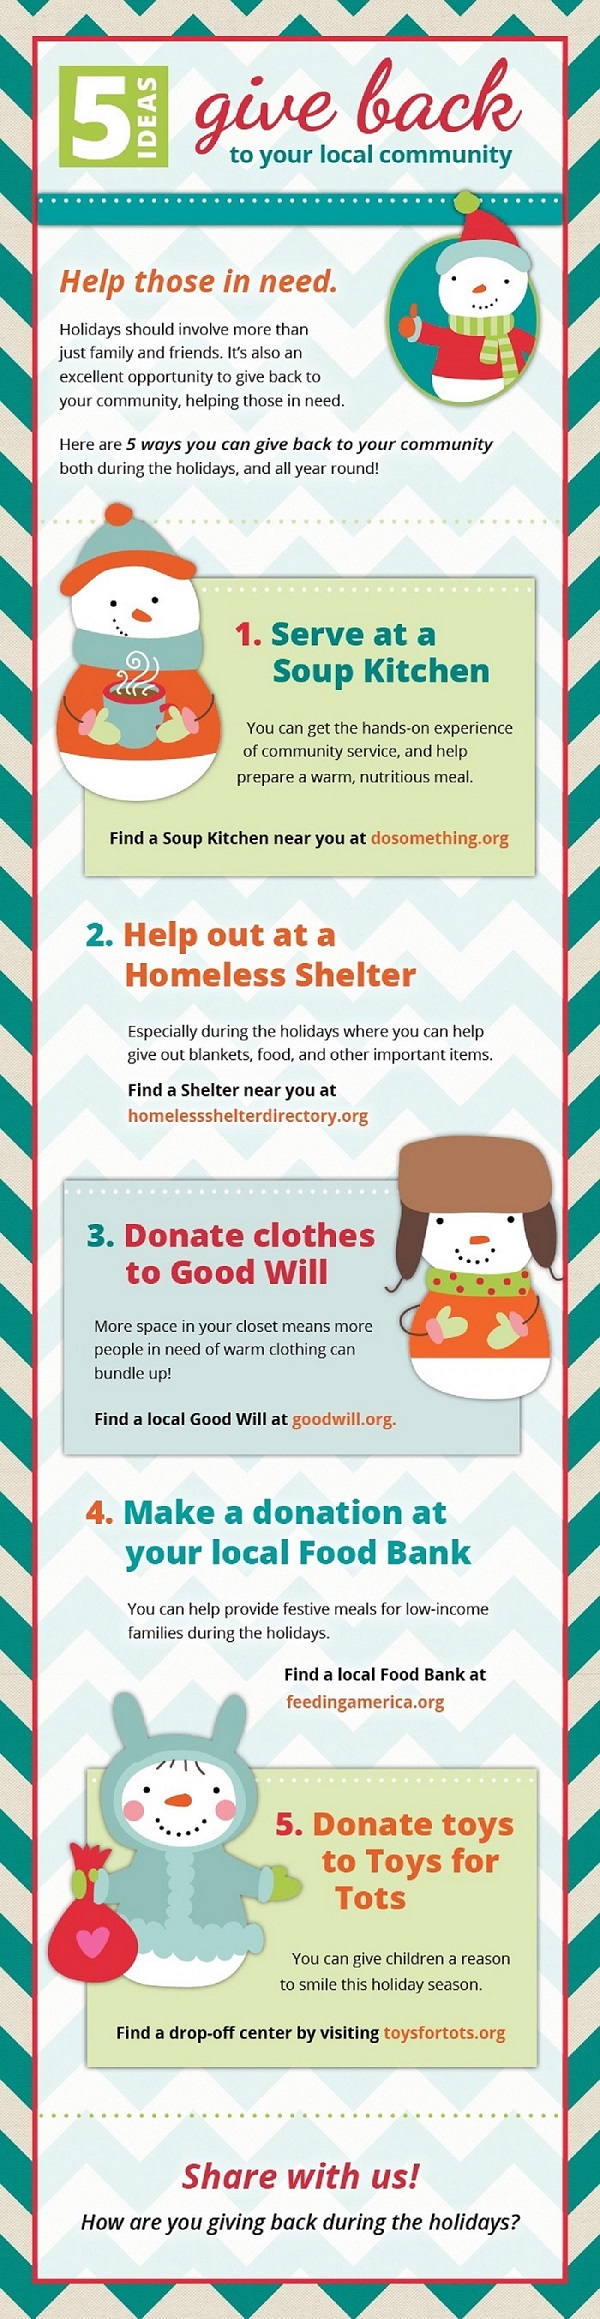 HolidayInfographic_GiveBack_web